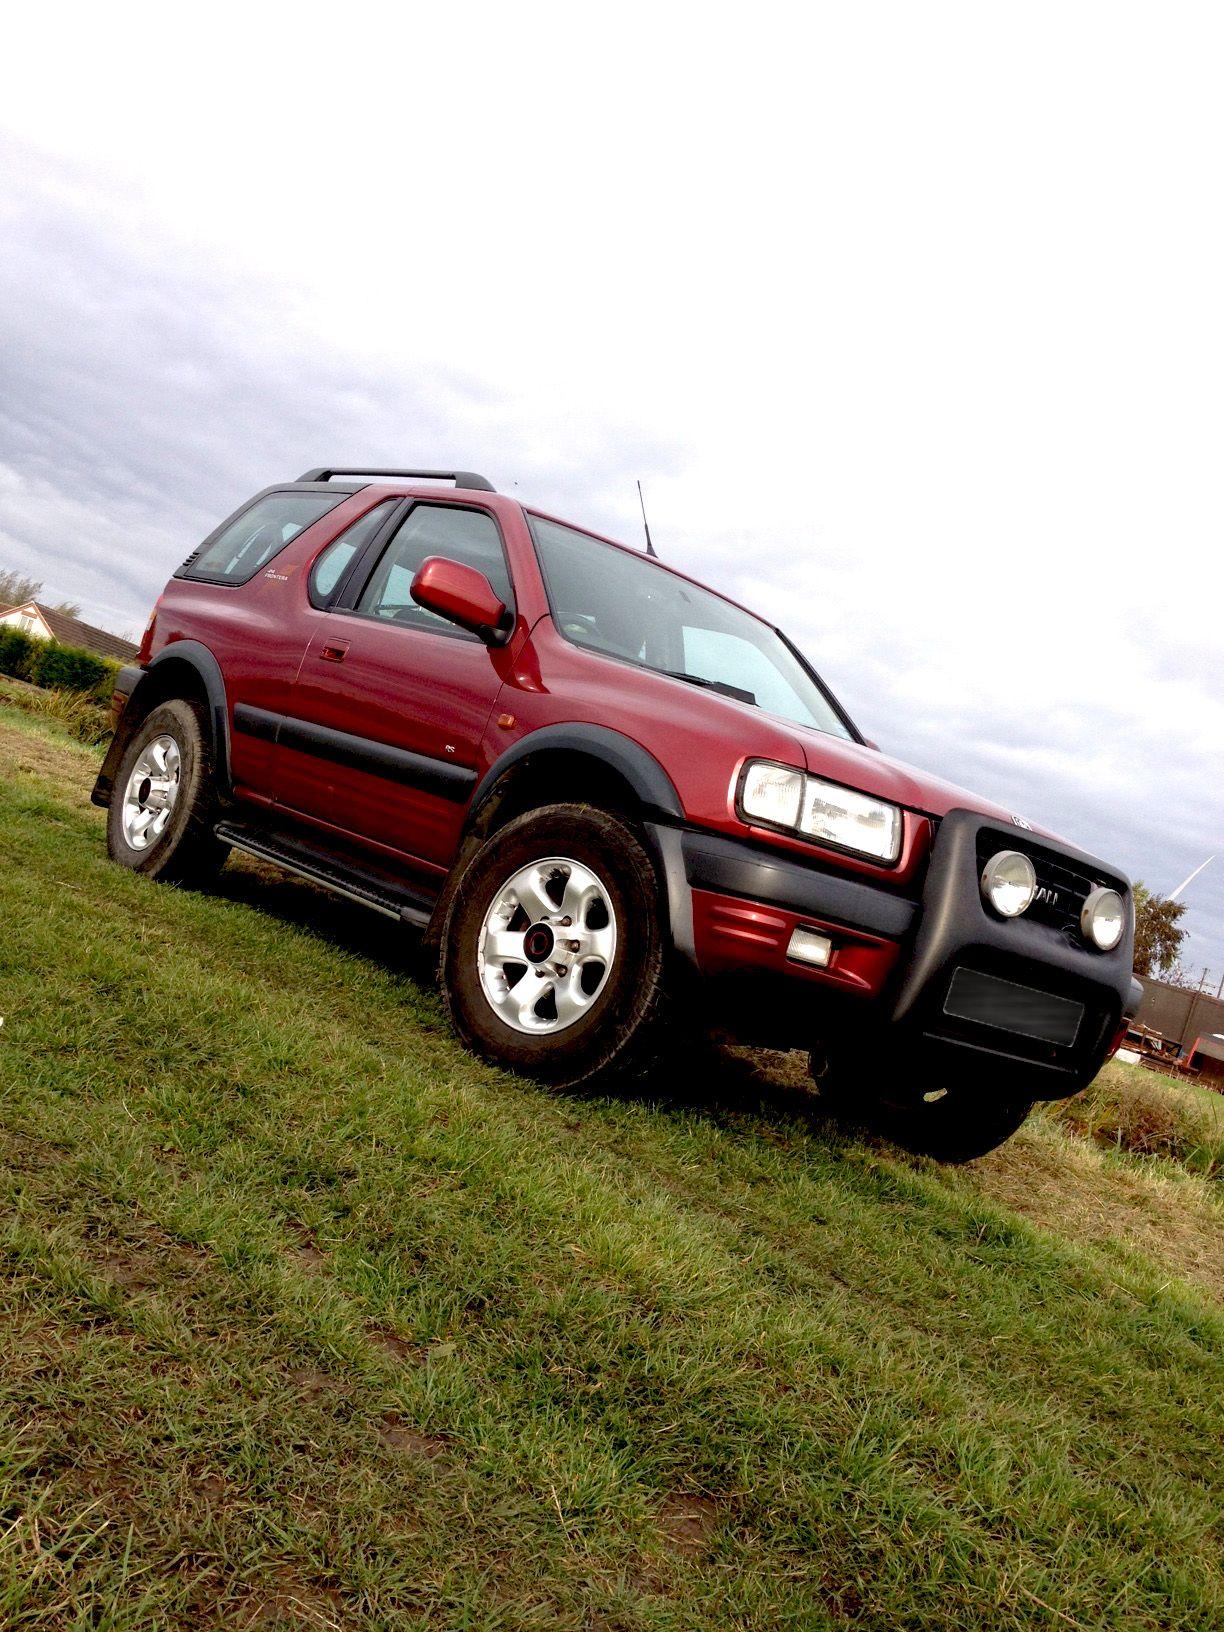 Vauxhall Frontera 2 2 Rs Cars 4x4 Vehicles